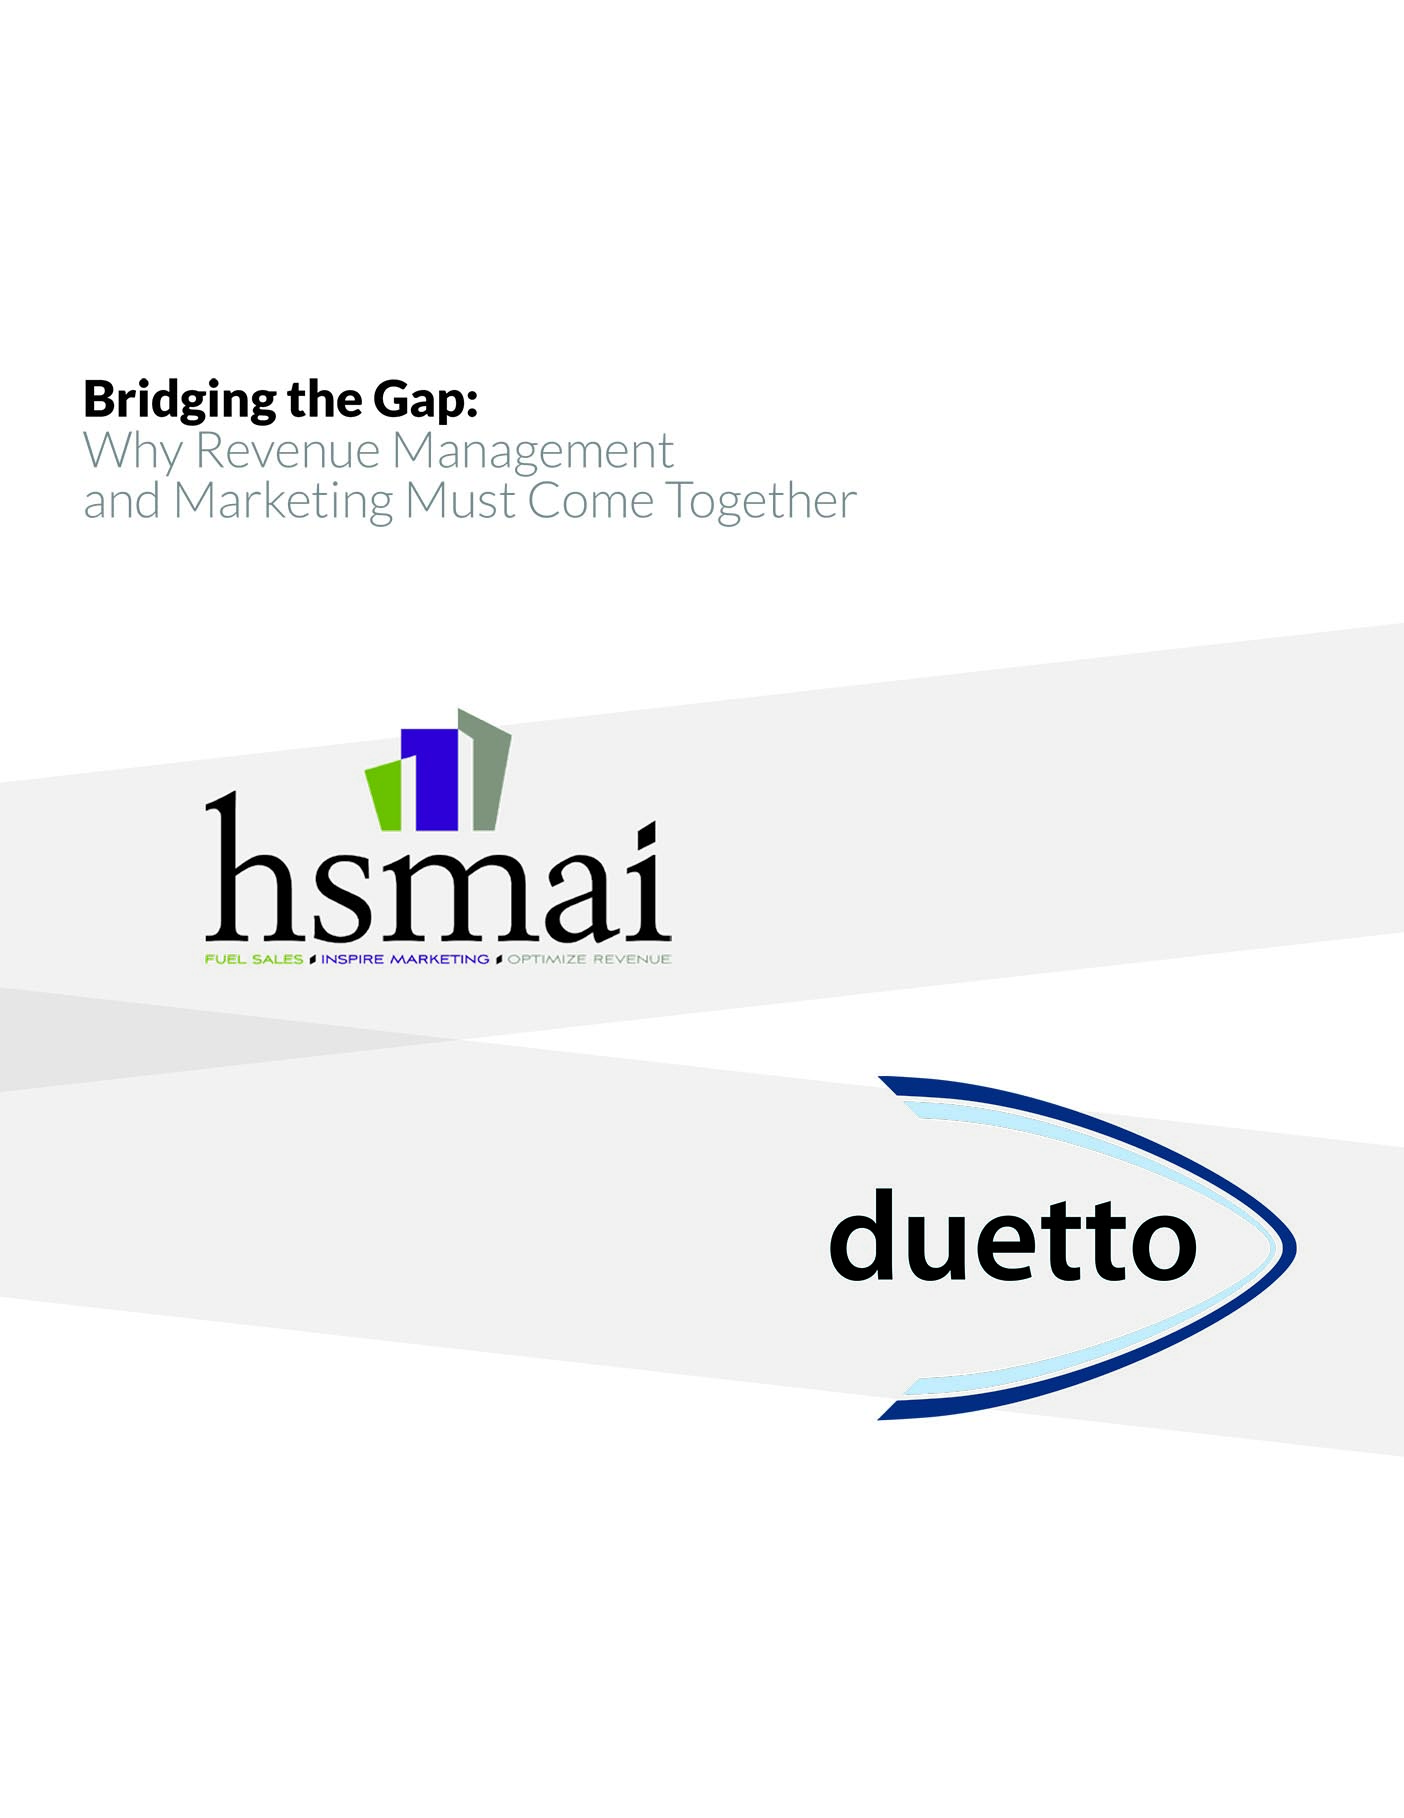 1 HSMAI - Bridging-the-Gap-Revenue-Management-Marketing-1.jpg